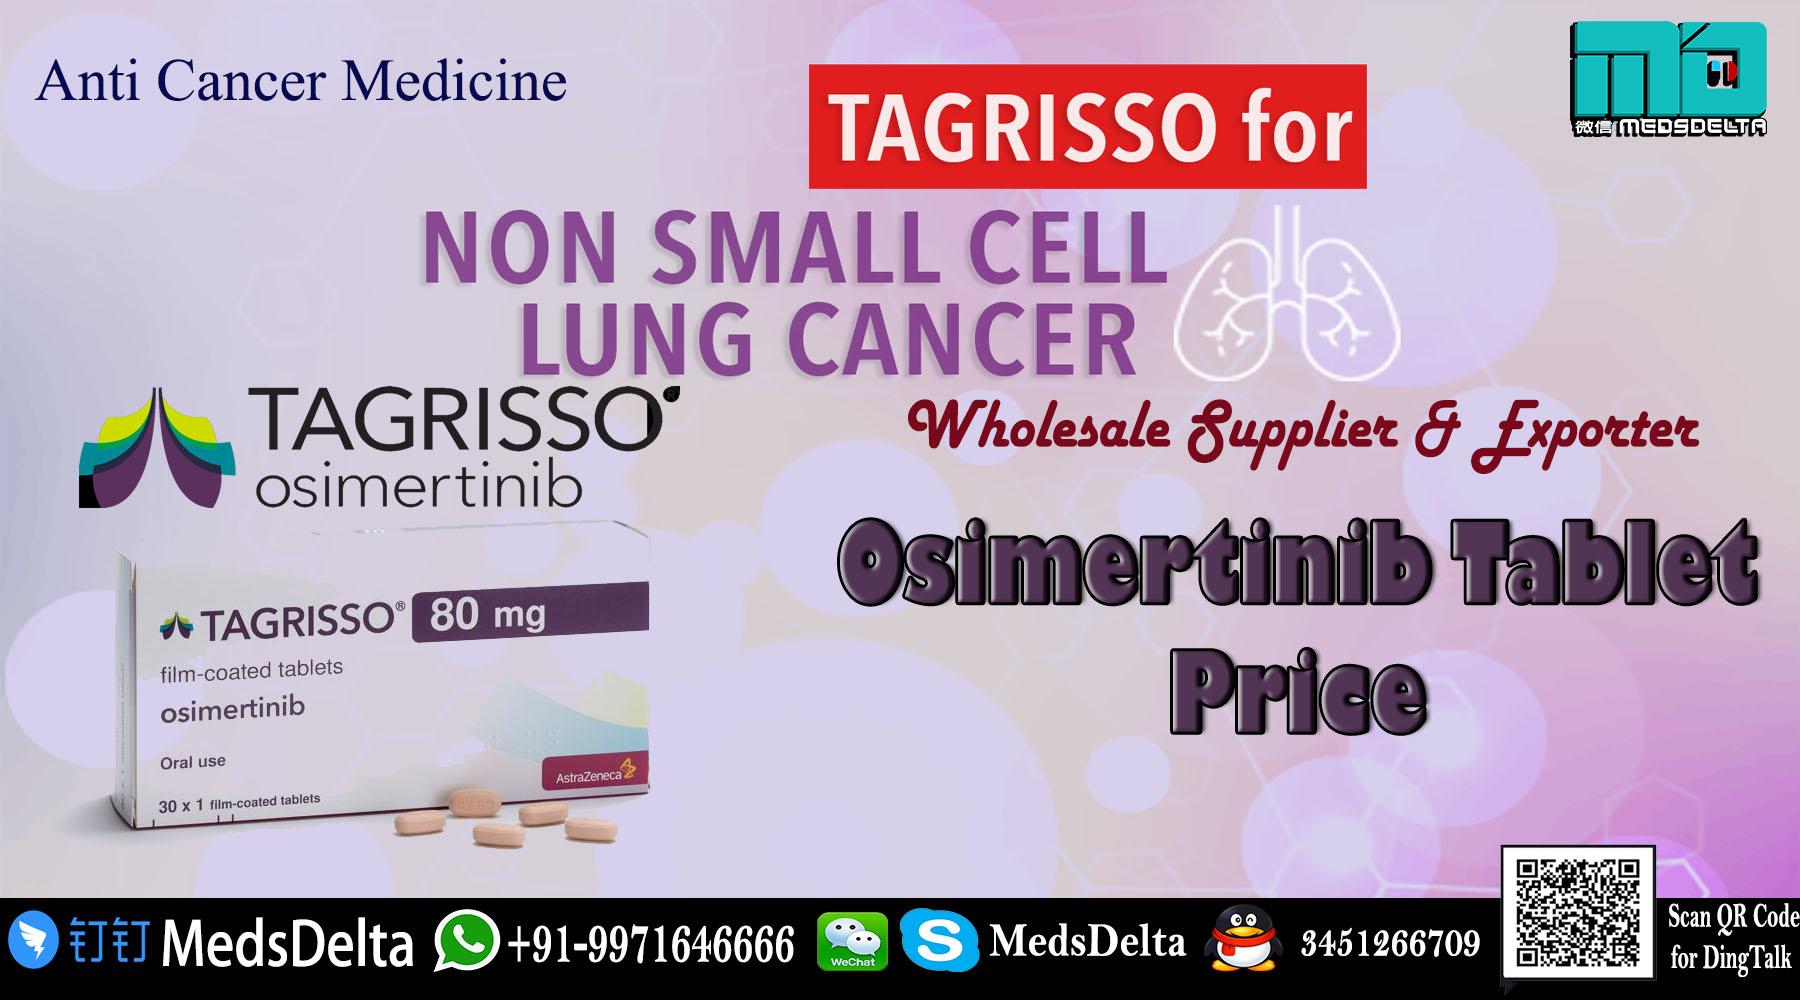 Osimertinib Price Online Tagrisso Supplier India